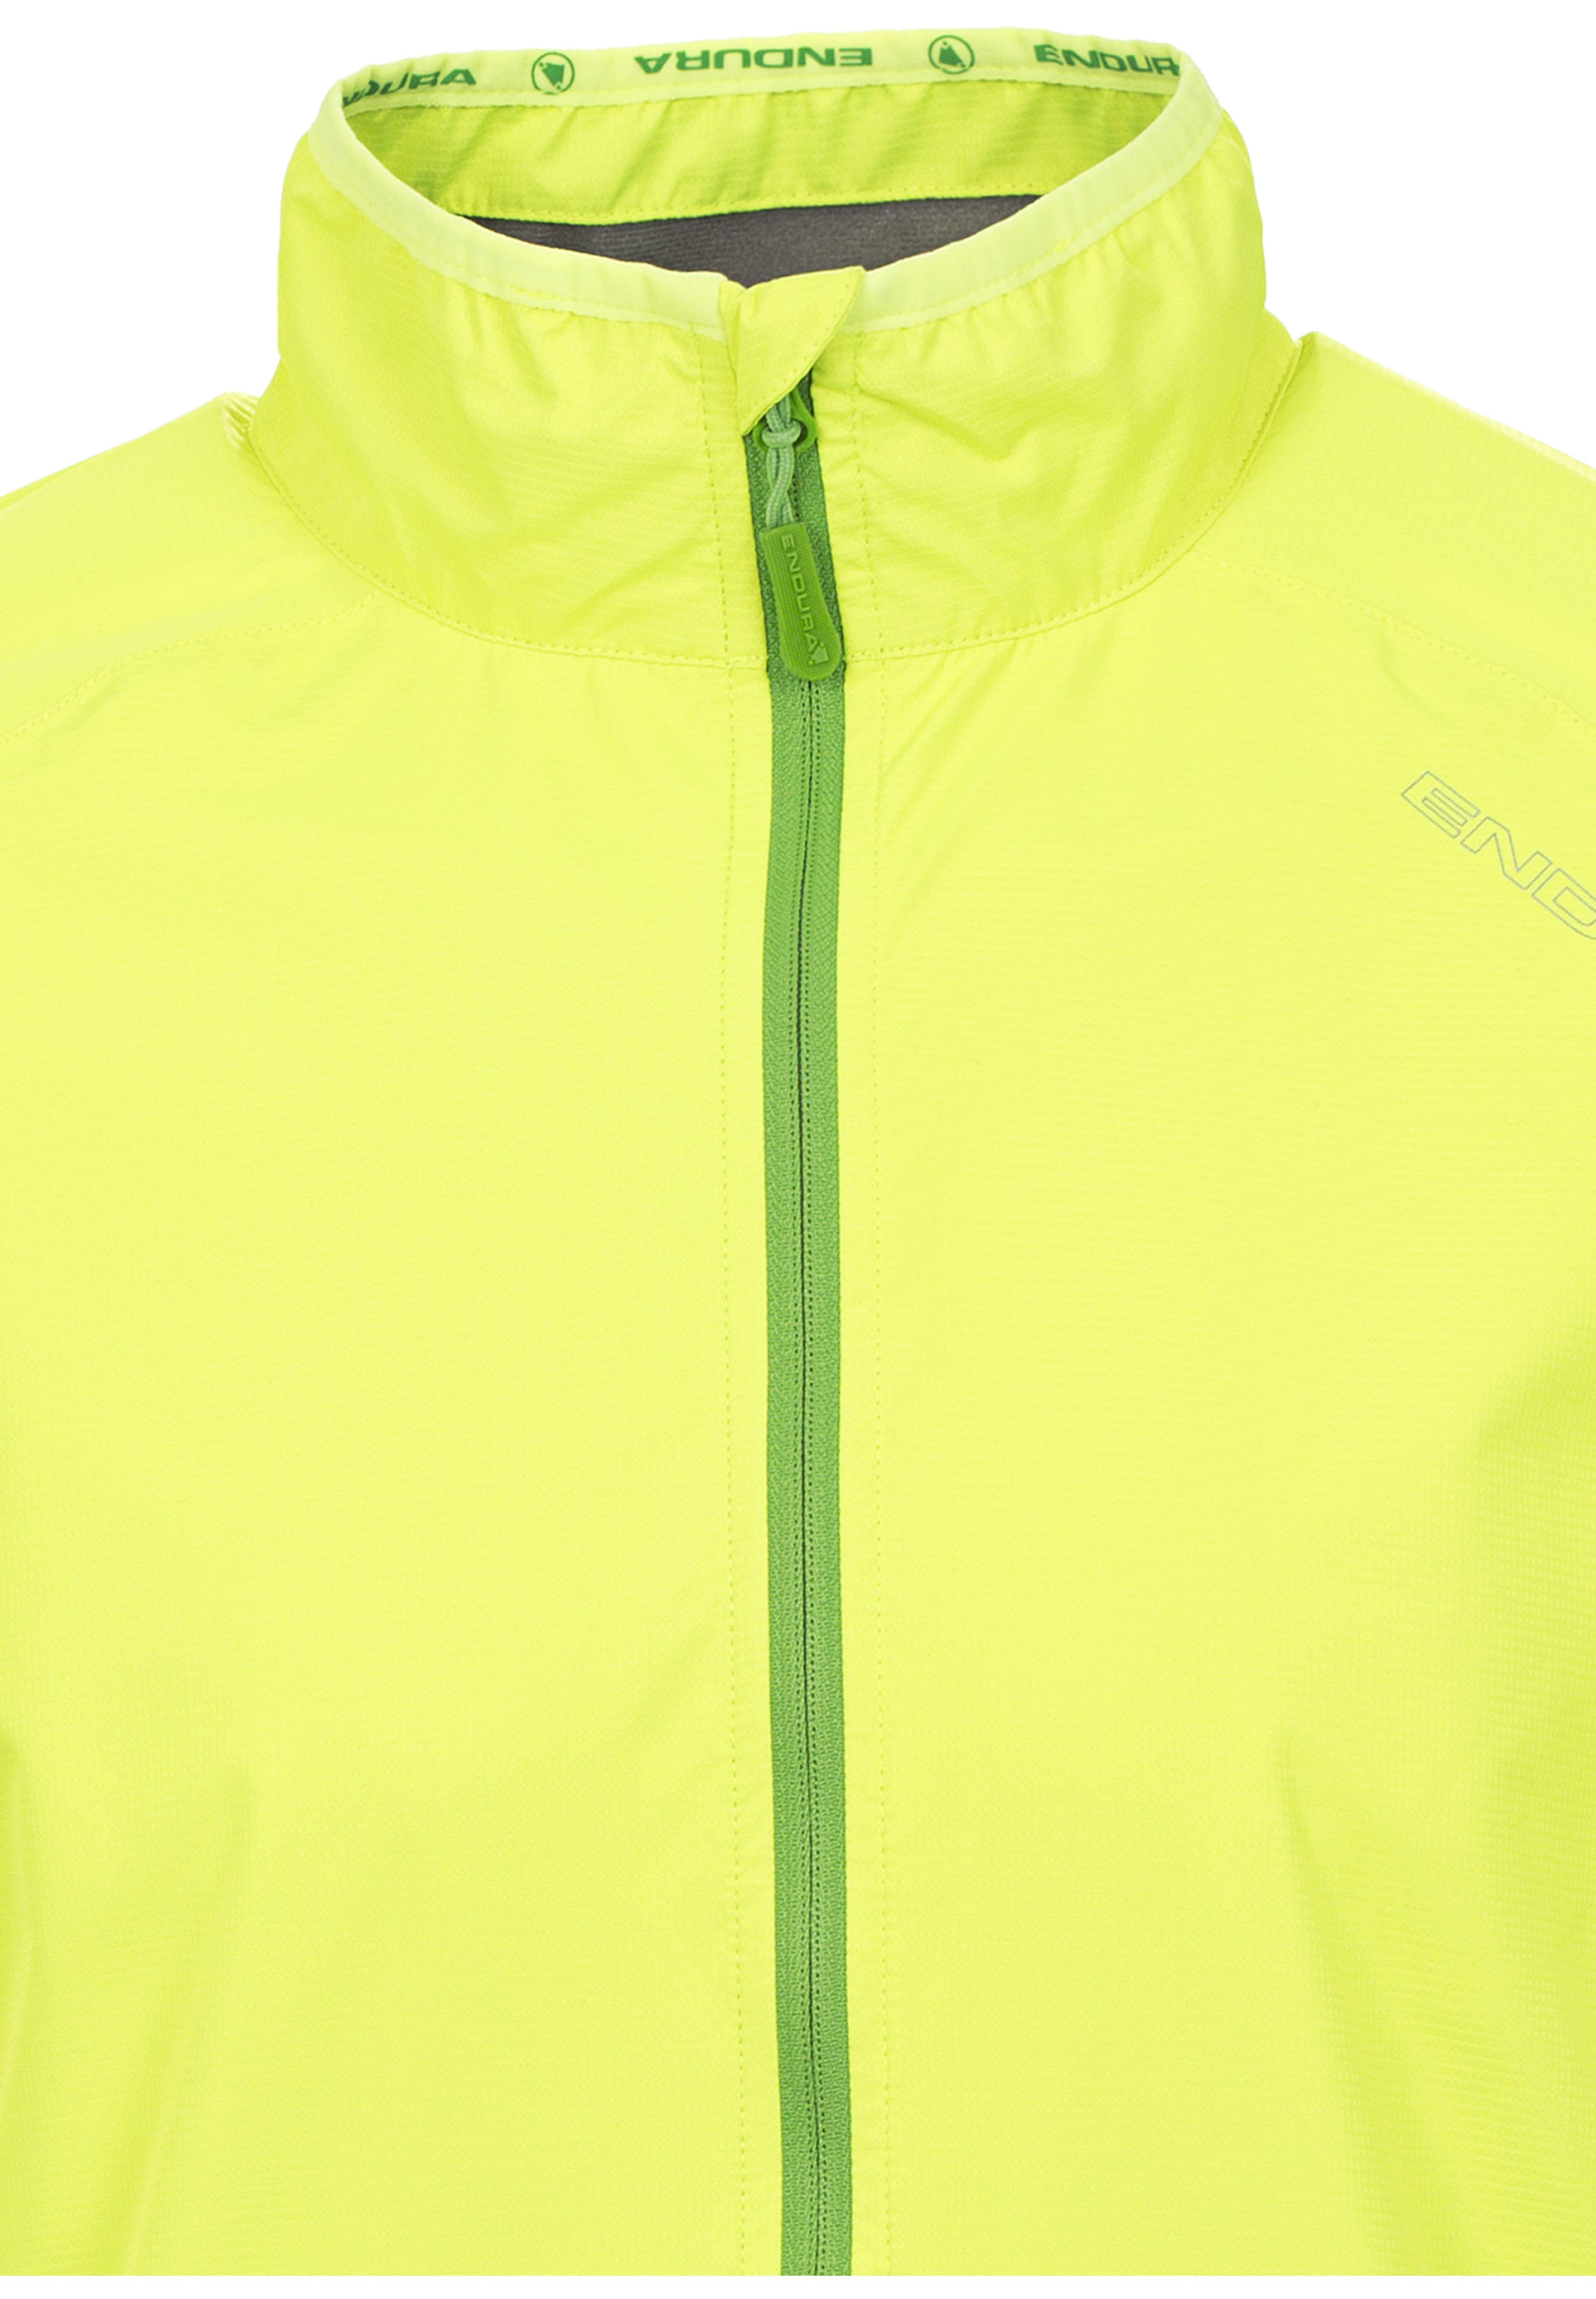 f83d30027 Endura Xtract Jacket Men yellow at Addnature.co.uk